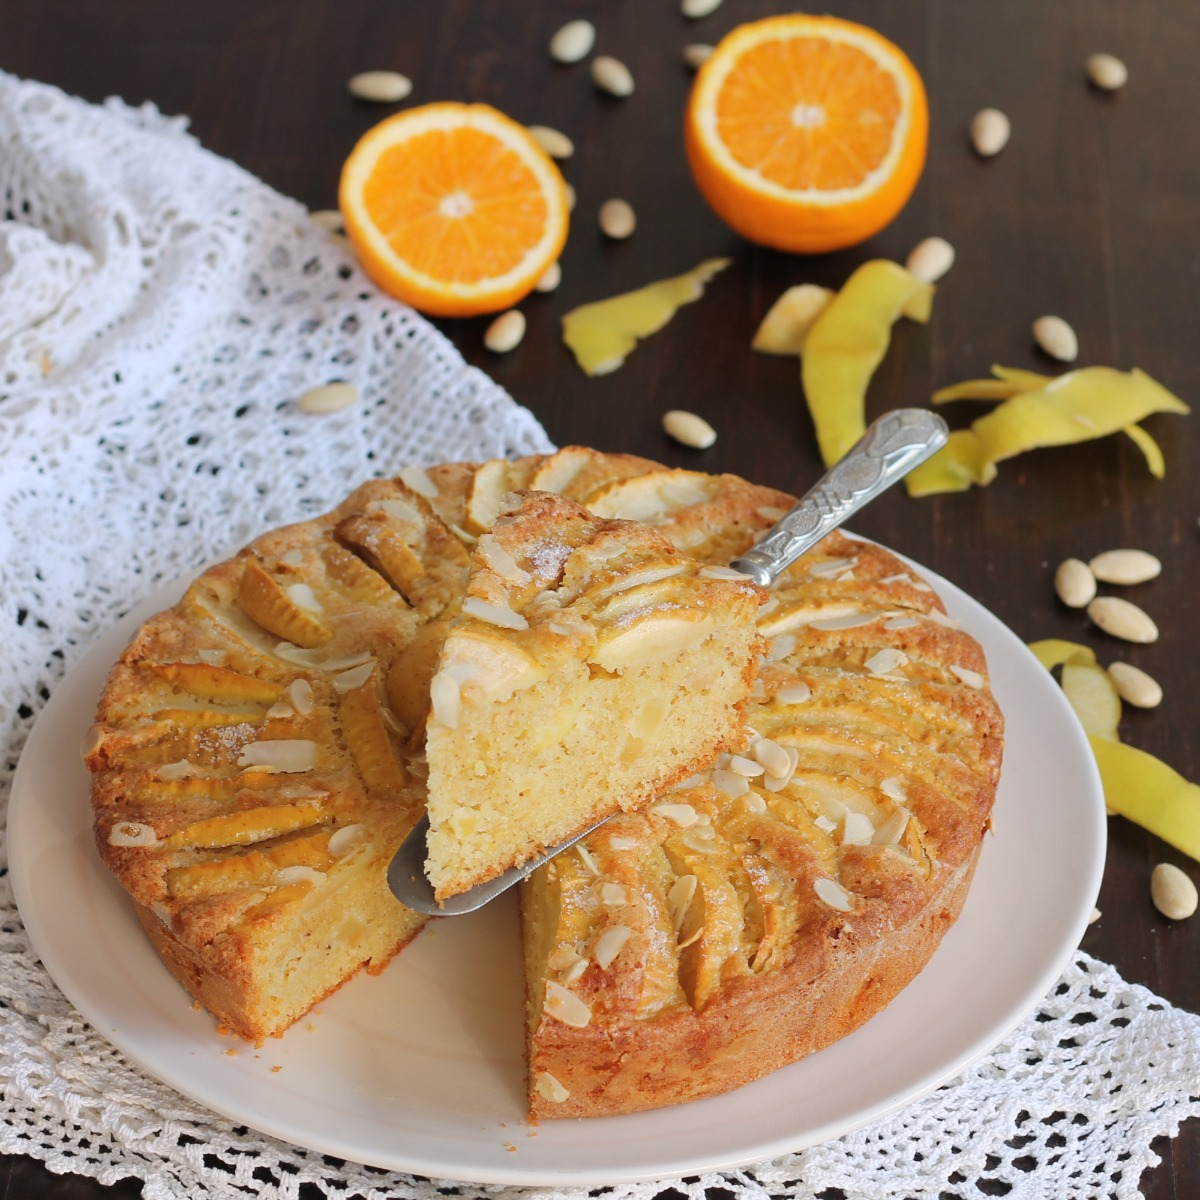 TORTA MELE ARANCIA MANDORLE ricetta torta di mele senza latte e burro